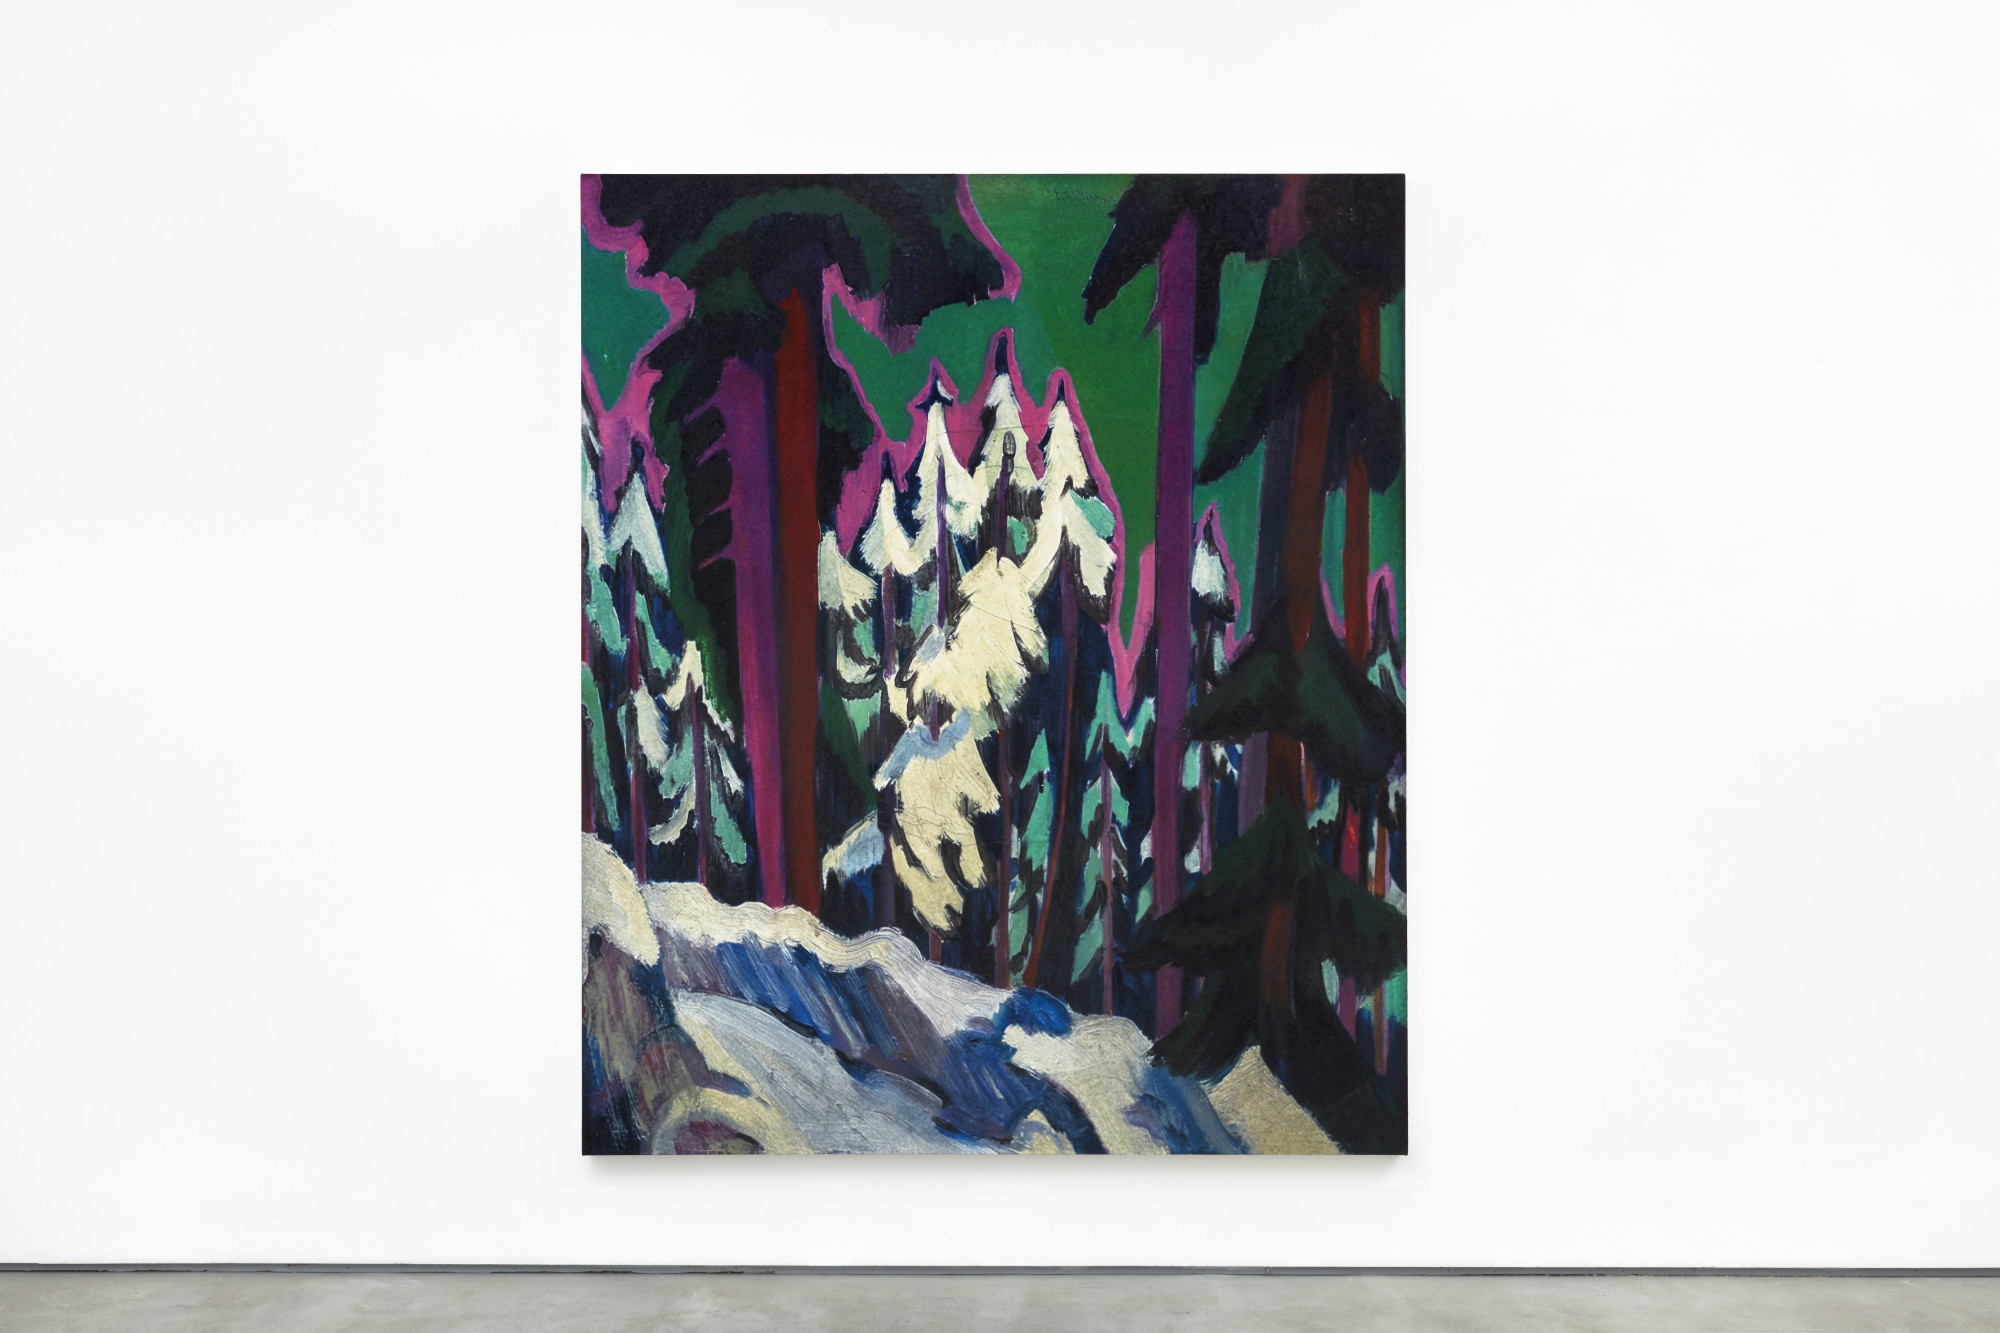 "<div class=""artwork_caption""><div class=""title""><i>Kirchner Wald im Winter 1925,</i>2019</div><div class=""medium"">oil on canvas</div><div class=""dimensions"">242.3 x 203 x 5.8 cm / 95 3/8 x 79 7/8 x 2 1/4 in</div></div><div class=""link""><span class=""website_contact_form"" data-contact-form-details=""Kirchner Wald im Winter 1925, 2019  oil on canvas  242.3 x 203 x 5.8 cm / 95 3/8 x 79 7/8 x 2 1/4 in"" data-contact-form-image=""https://artlogic-res.cloudinary.com/w_200,h_200,c_fill,f_auto,fl_lossy/ws-sadiecoles/usr/exhibitions/images/exhibitions/854/hq24-rs17209p_wald_im_winter_1.jpg"">Enquire</span></div>"